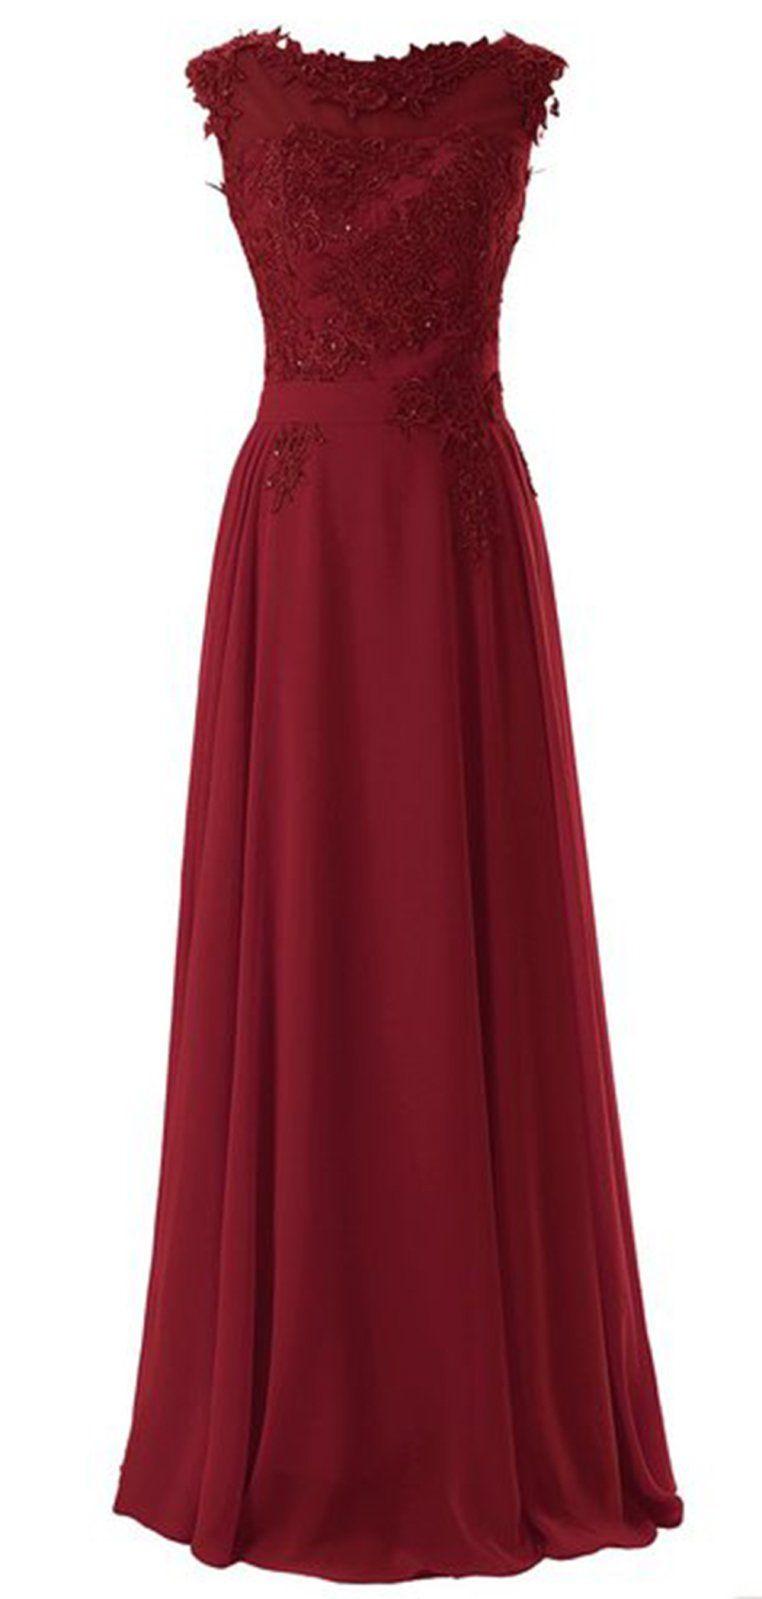 Formal Luxurius Abend Kleid Bei Amazon Bester Preis15 Perfekt Abend Kleid Bei Amazon Vertrieb